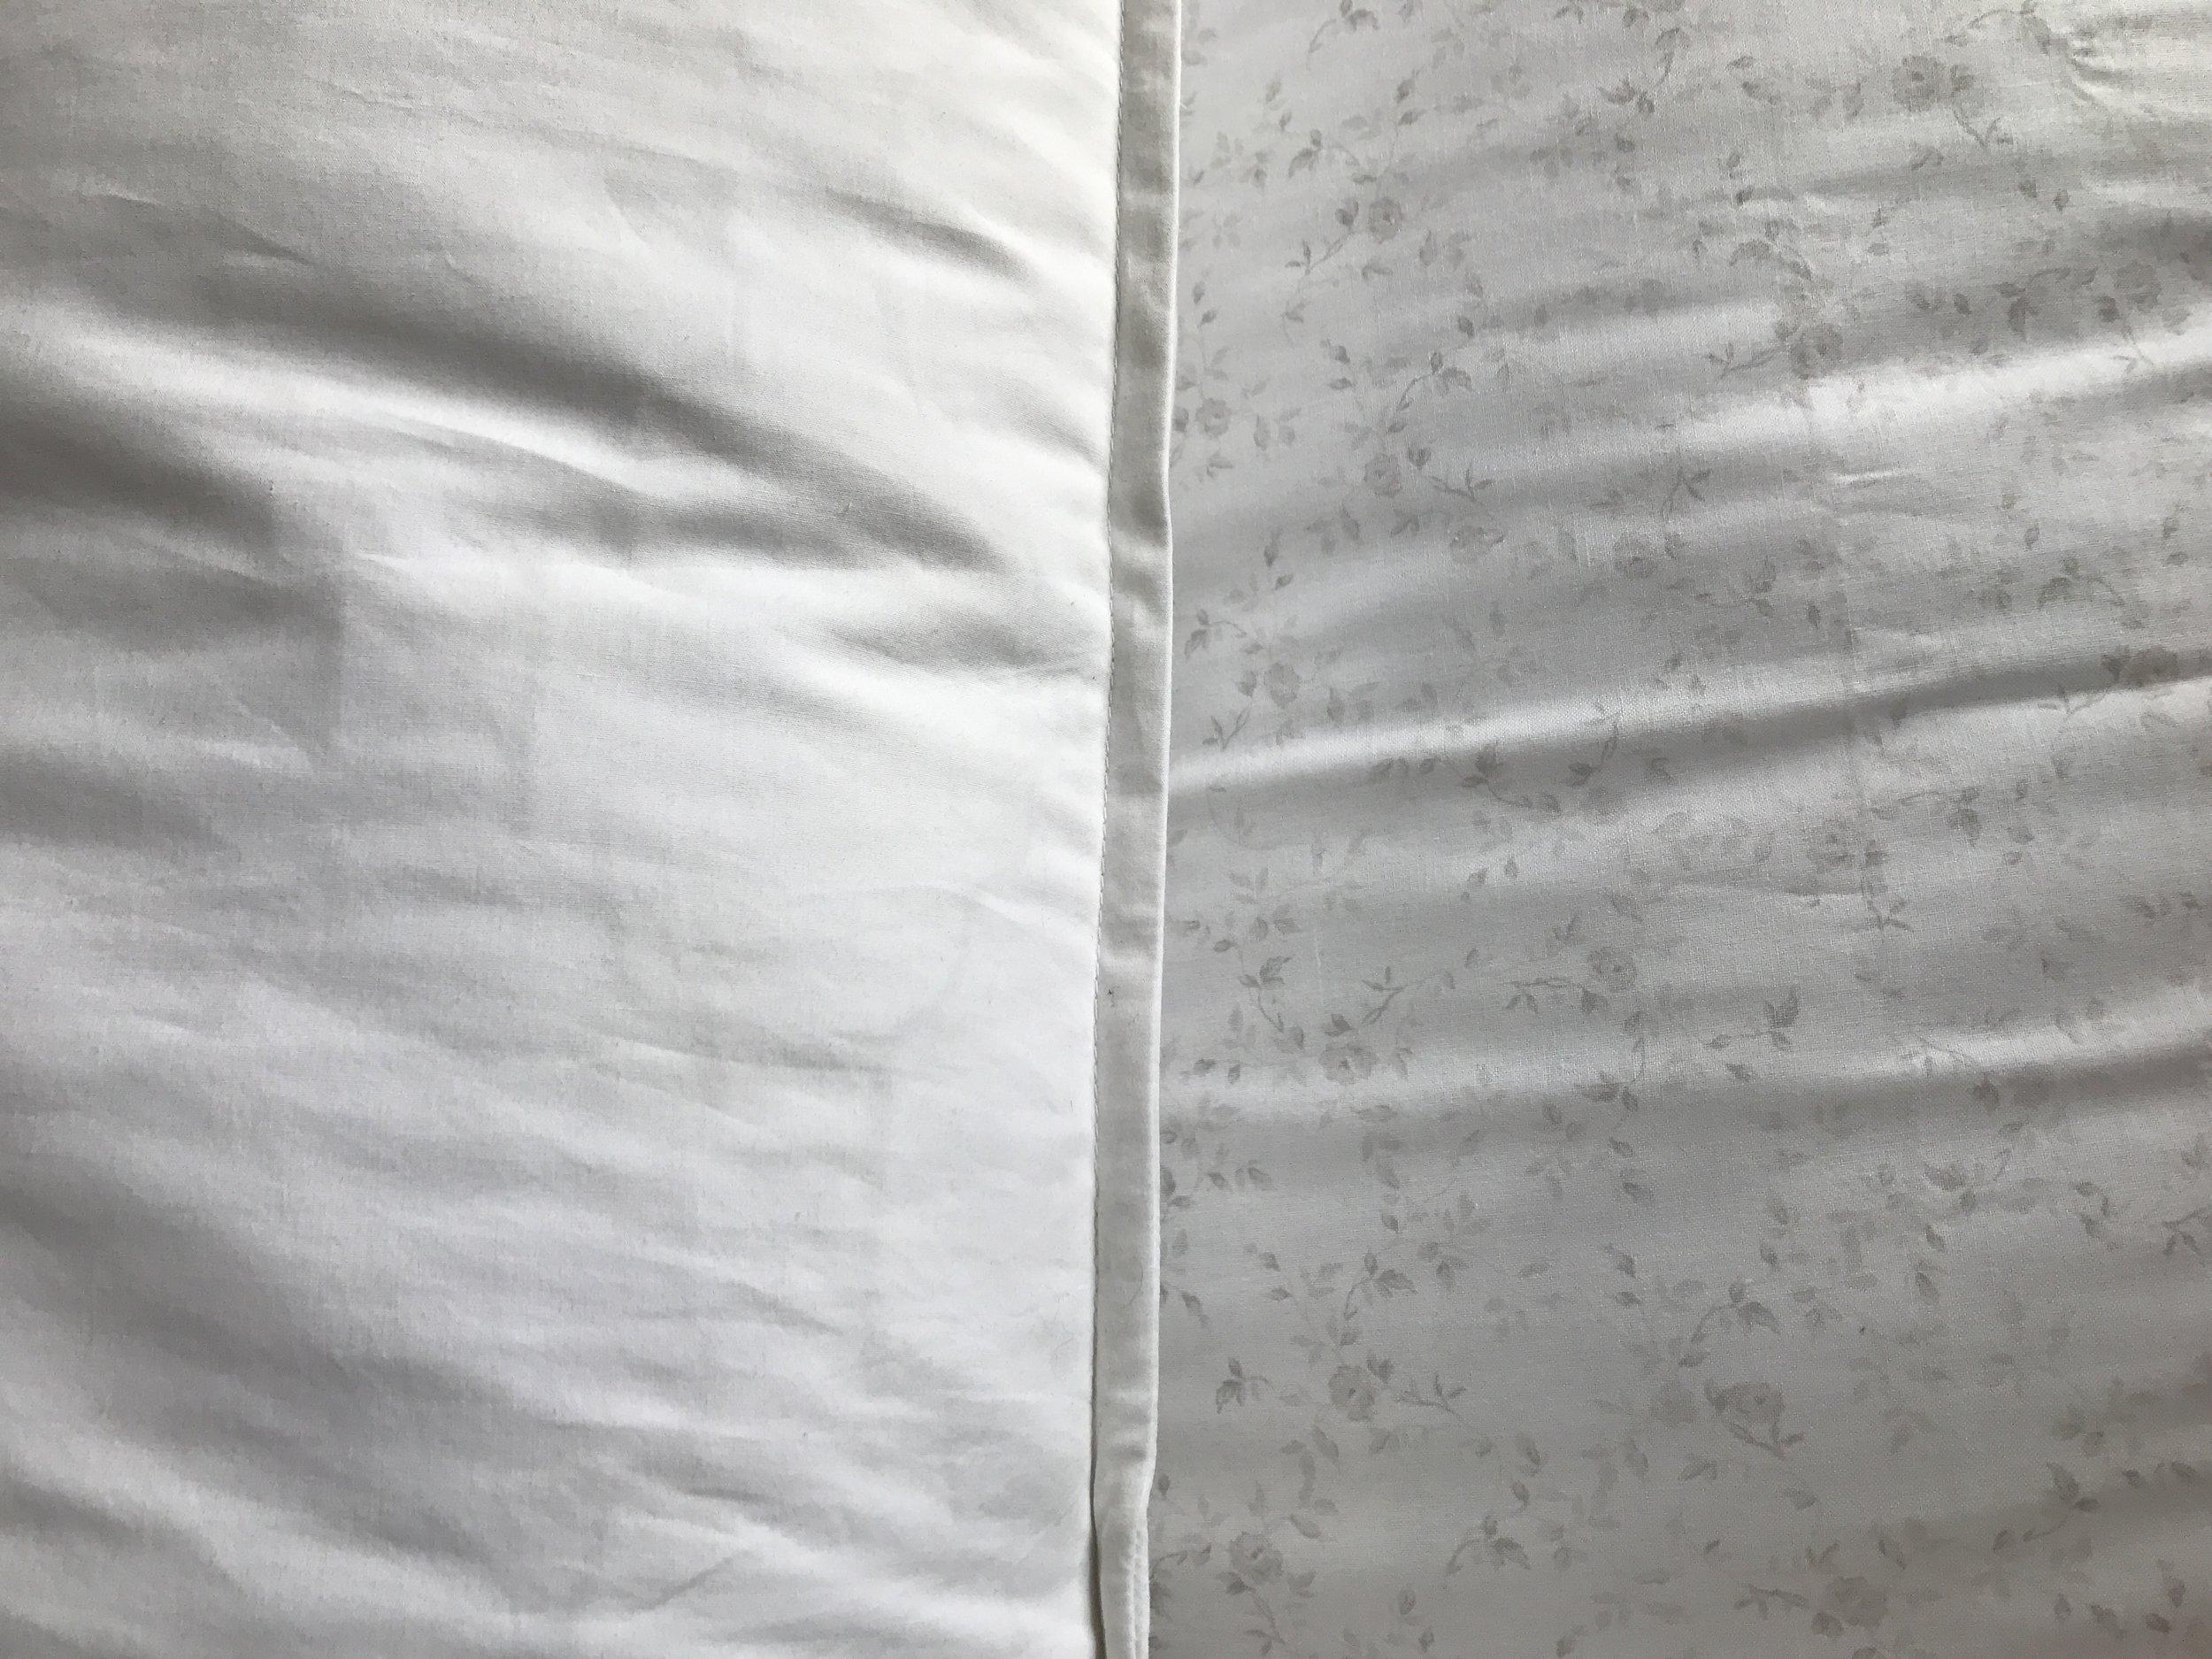 ailise+pillow+set+by+csevenm.JPG